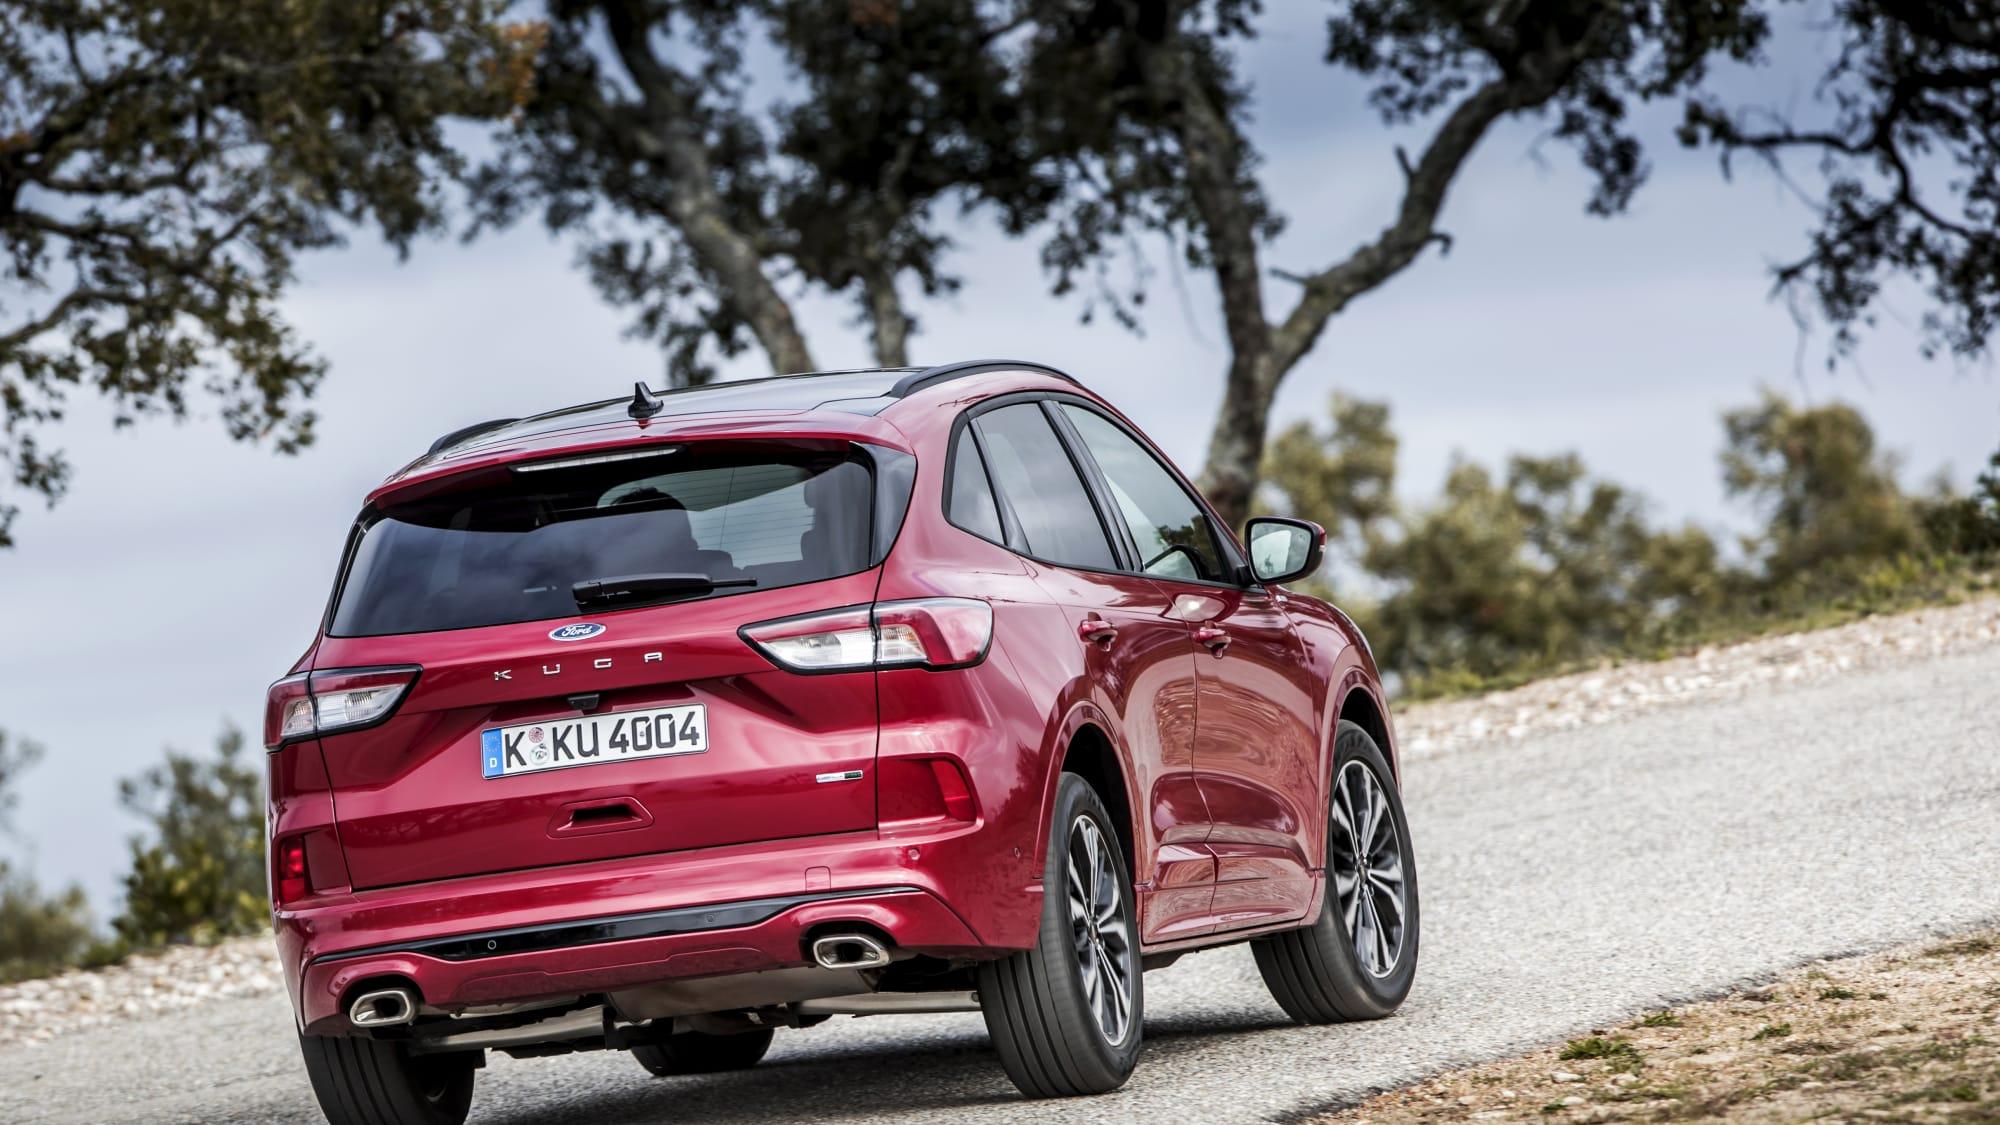 Neuer Ford Kuga 2020 Testfahrt Infos Daten Hybrid Adac